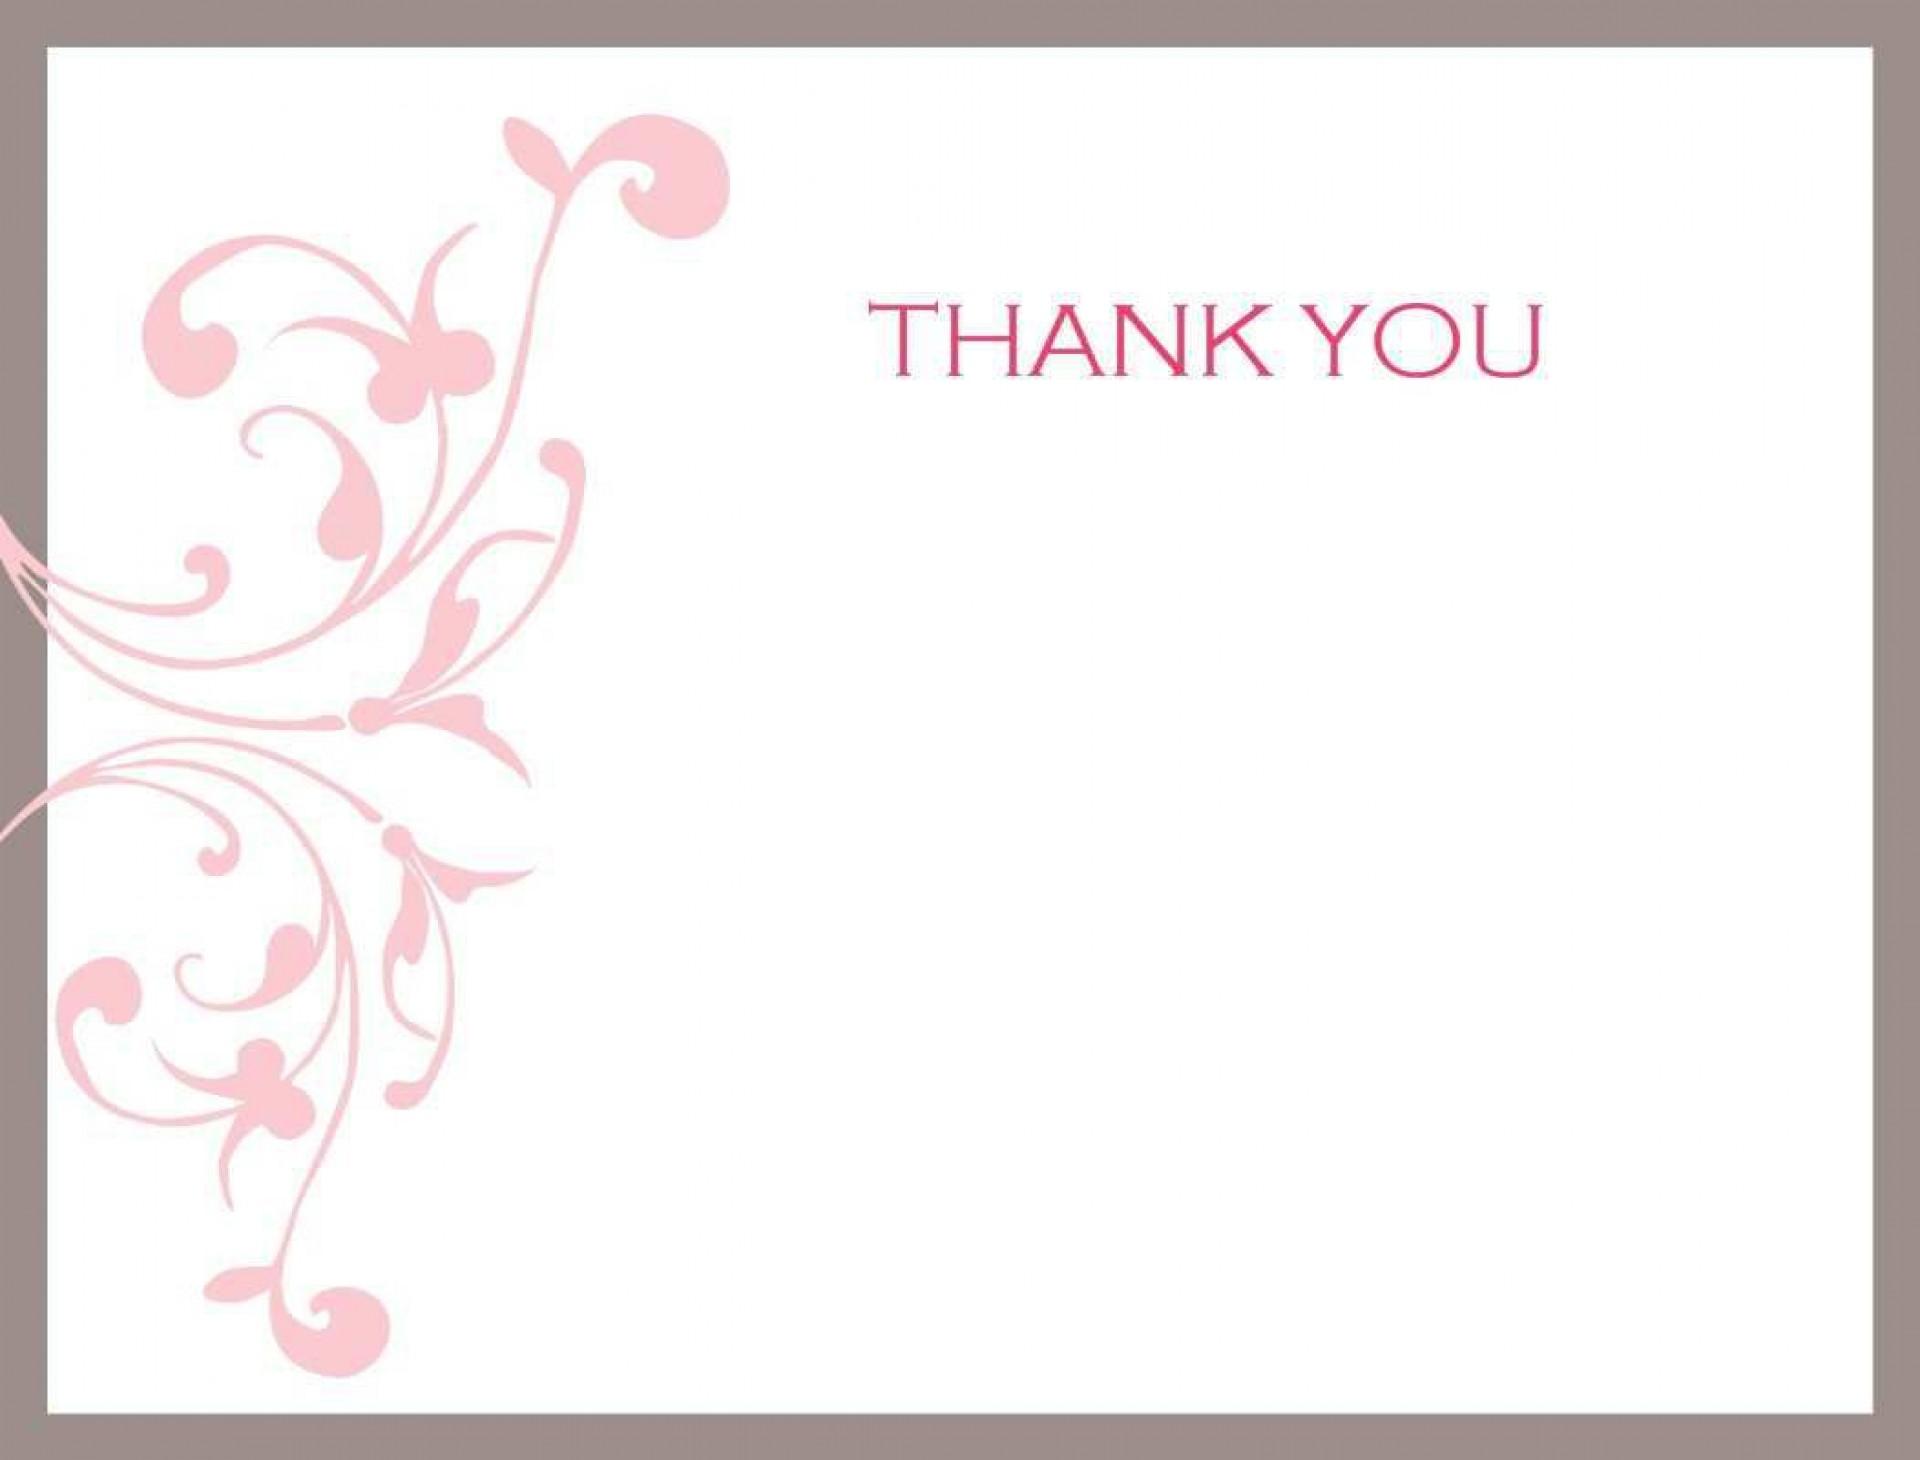 004 Impressive Thank You Note Template Free High Resolution  Poshmark Teacher1920